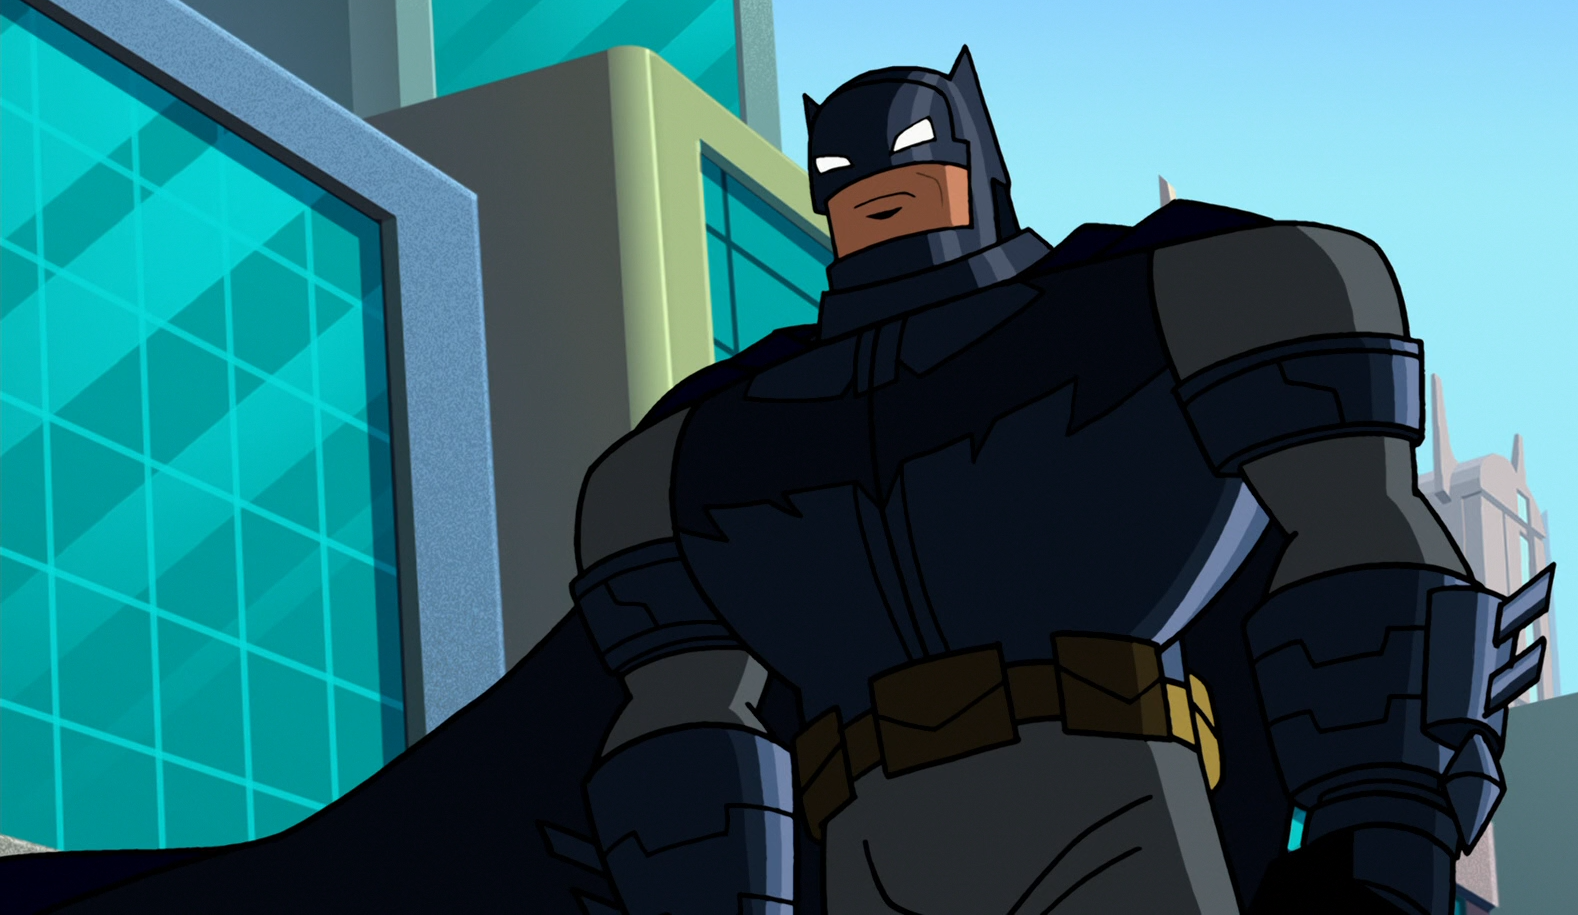 File:Bruce Wayne BTBATB 014.png